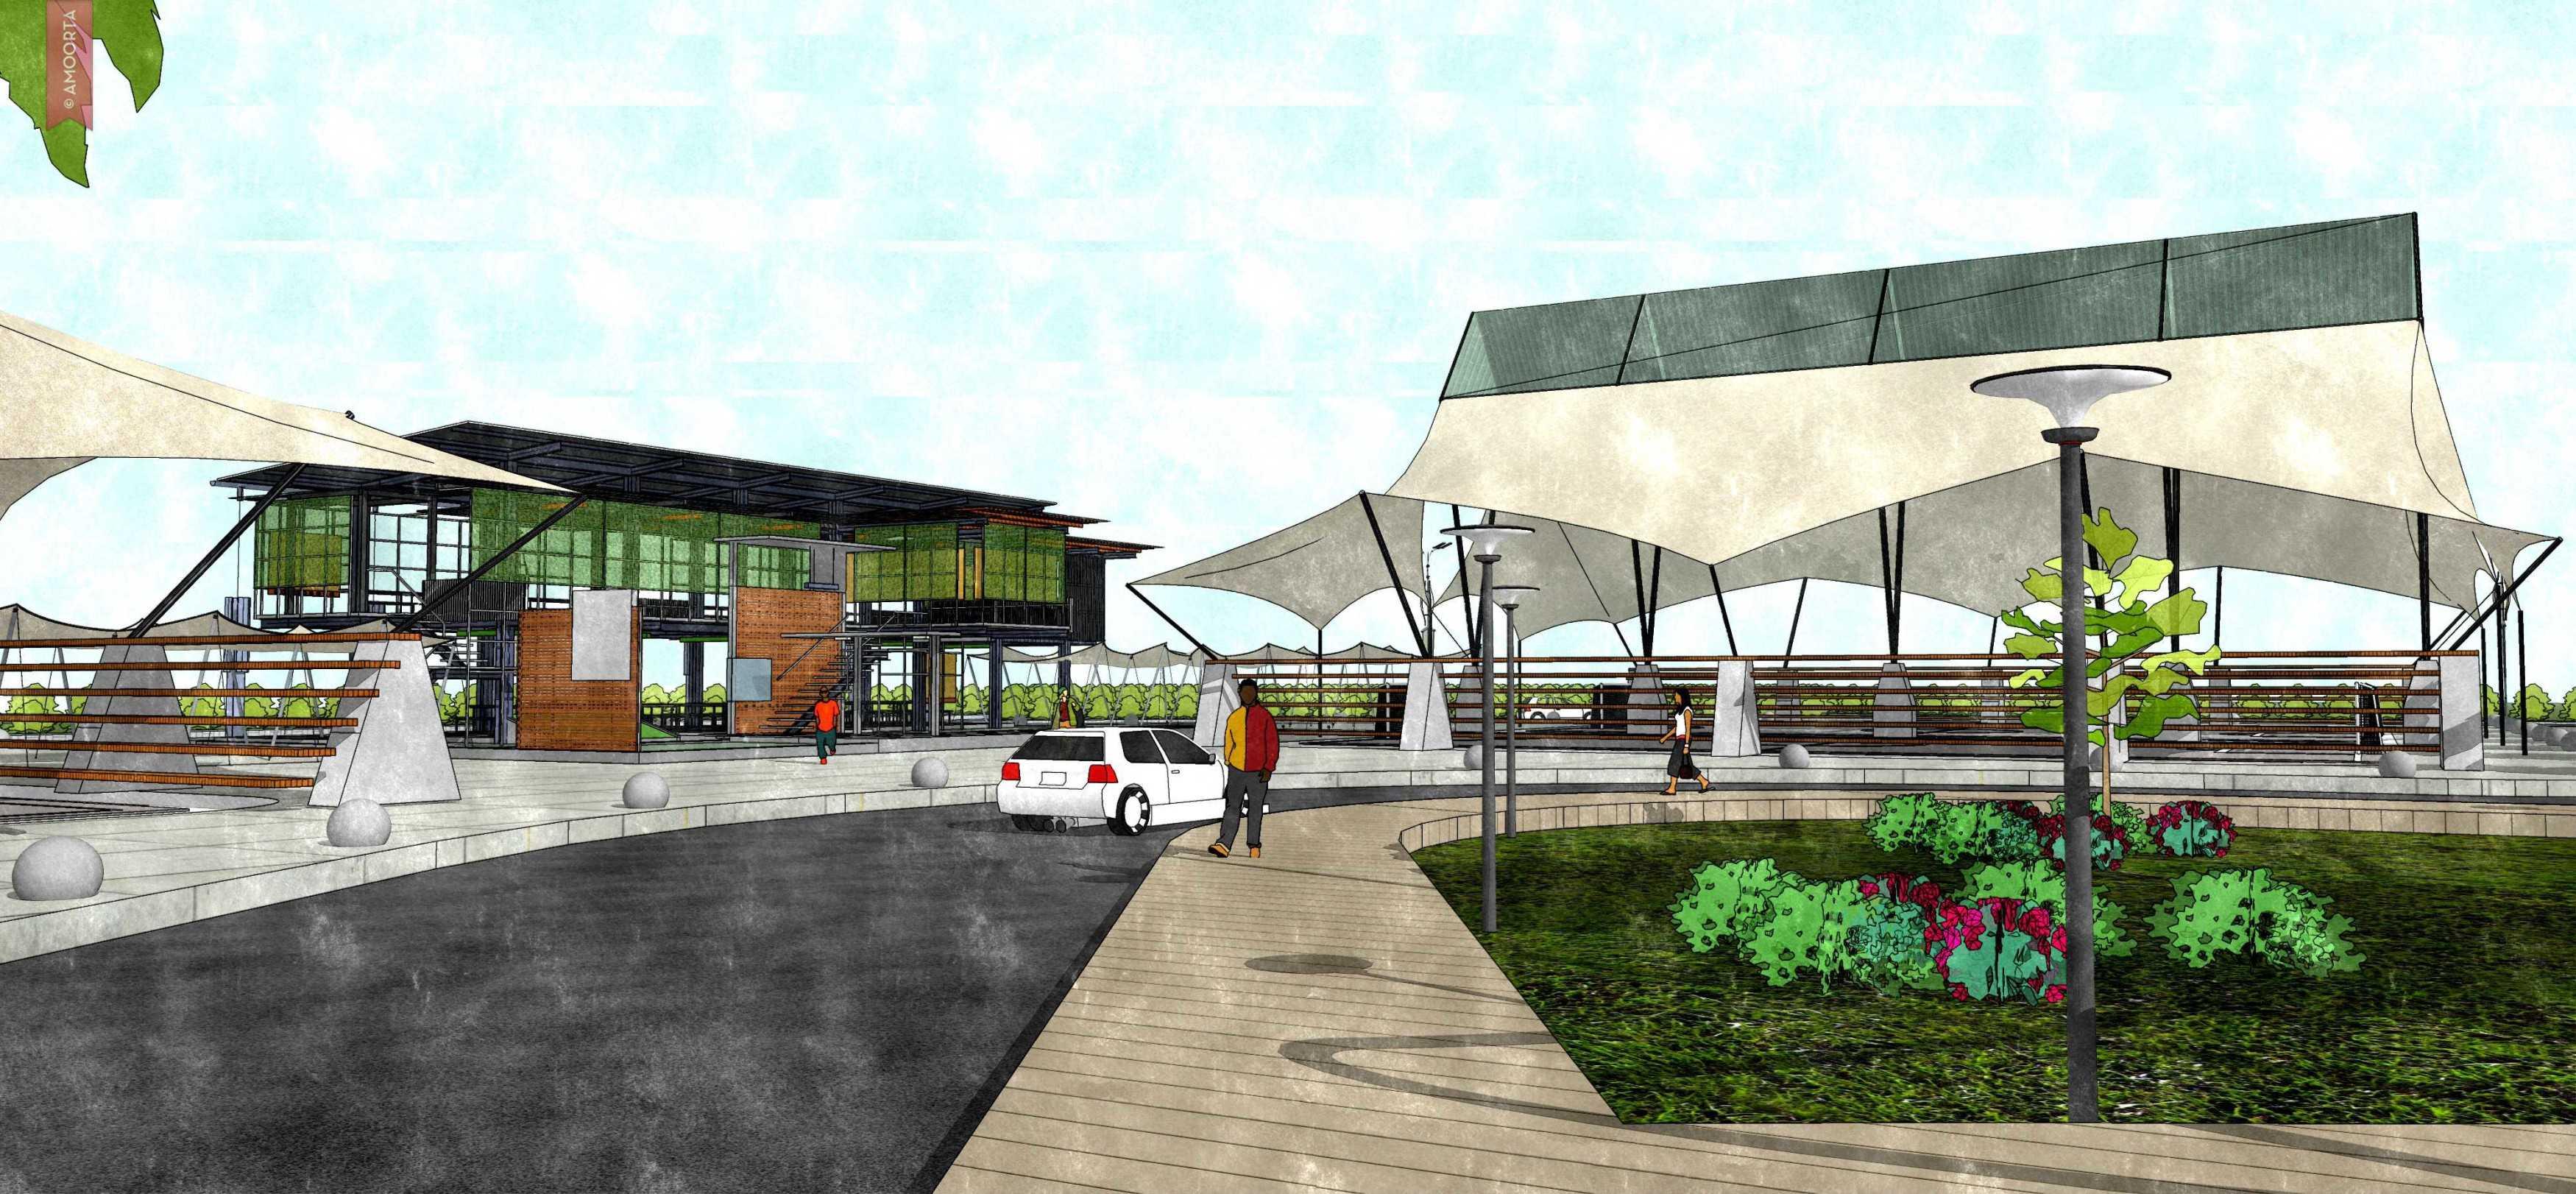 Amorta Design Studio Arena Pertemuan Oval Teluk Wondama , Papua Teluk Wondama , Papua 20130629-Arena-Pertemuan-Oval-Teluk-Wondamawb-06   29417